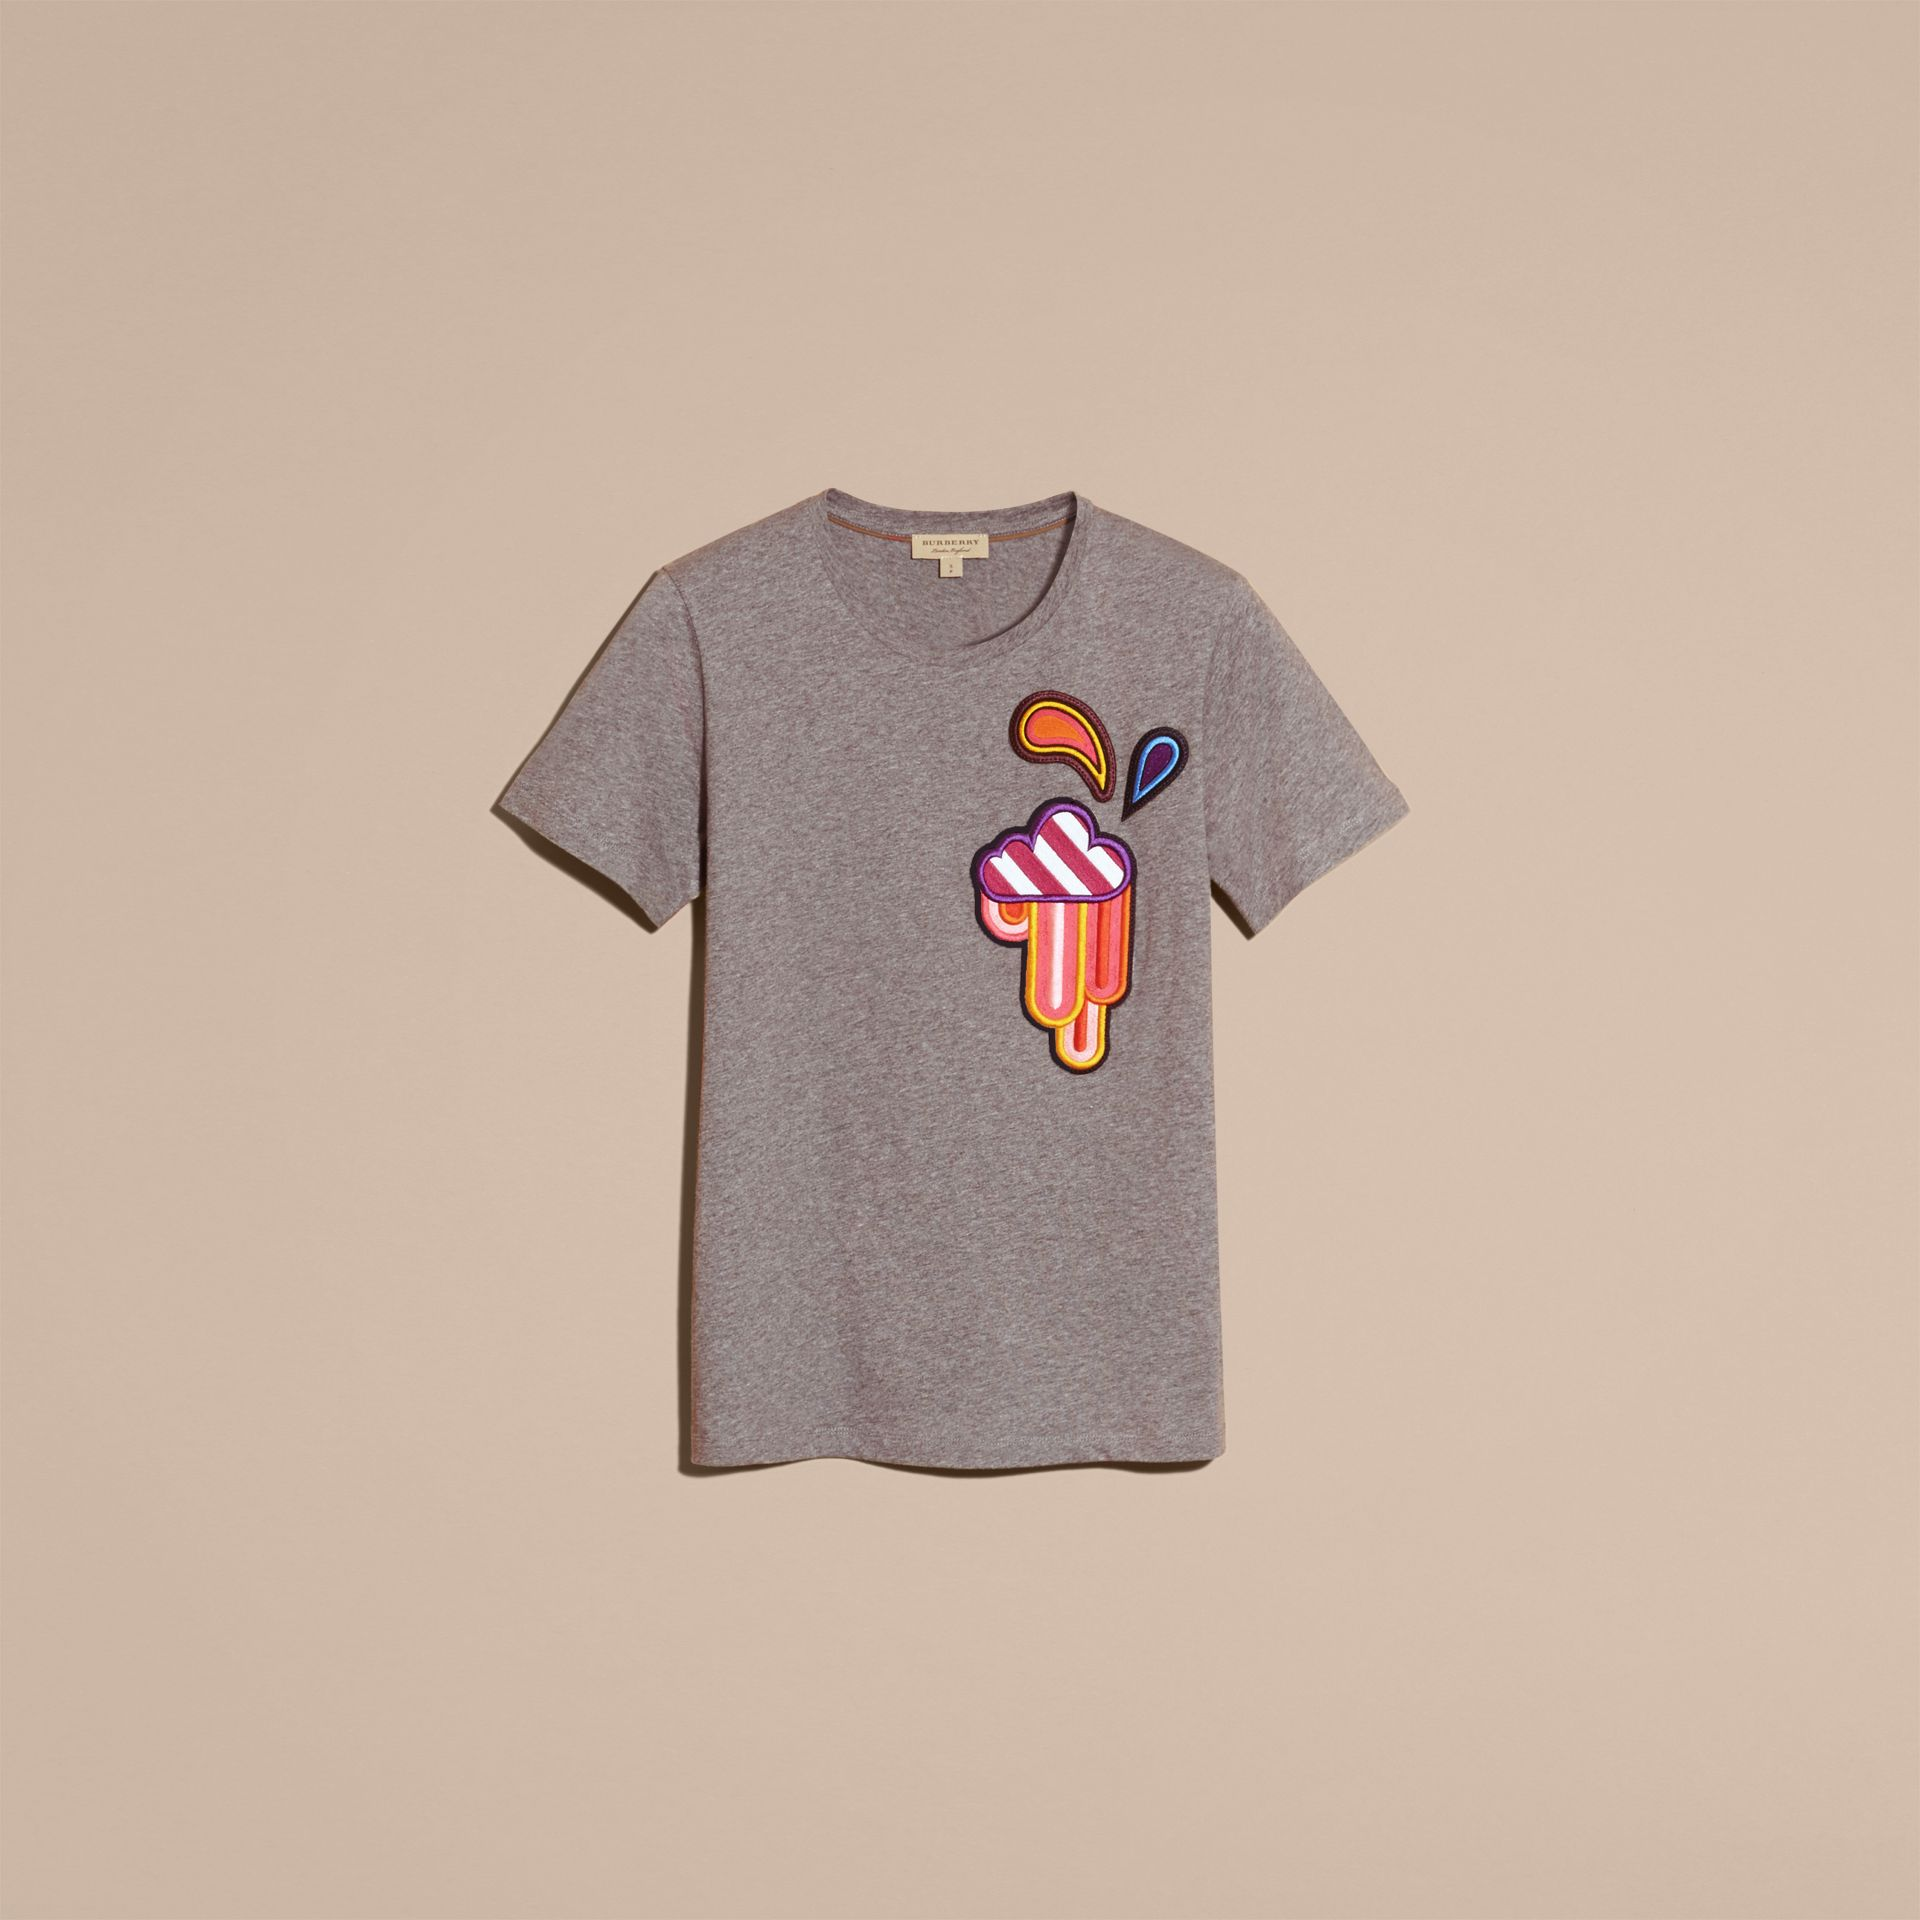 Appliquéd Weather Motif Cotton T-shirt Mid Grey Melange - gallery image 4